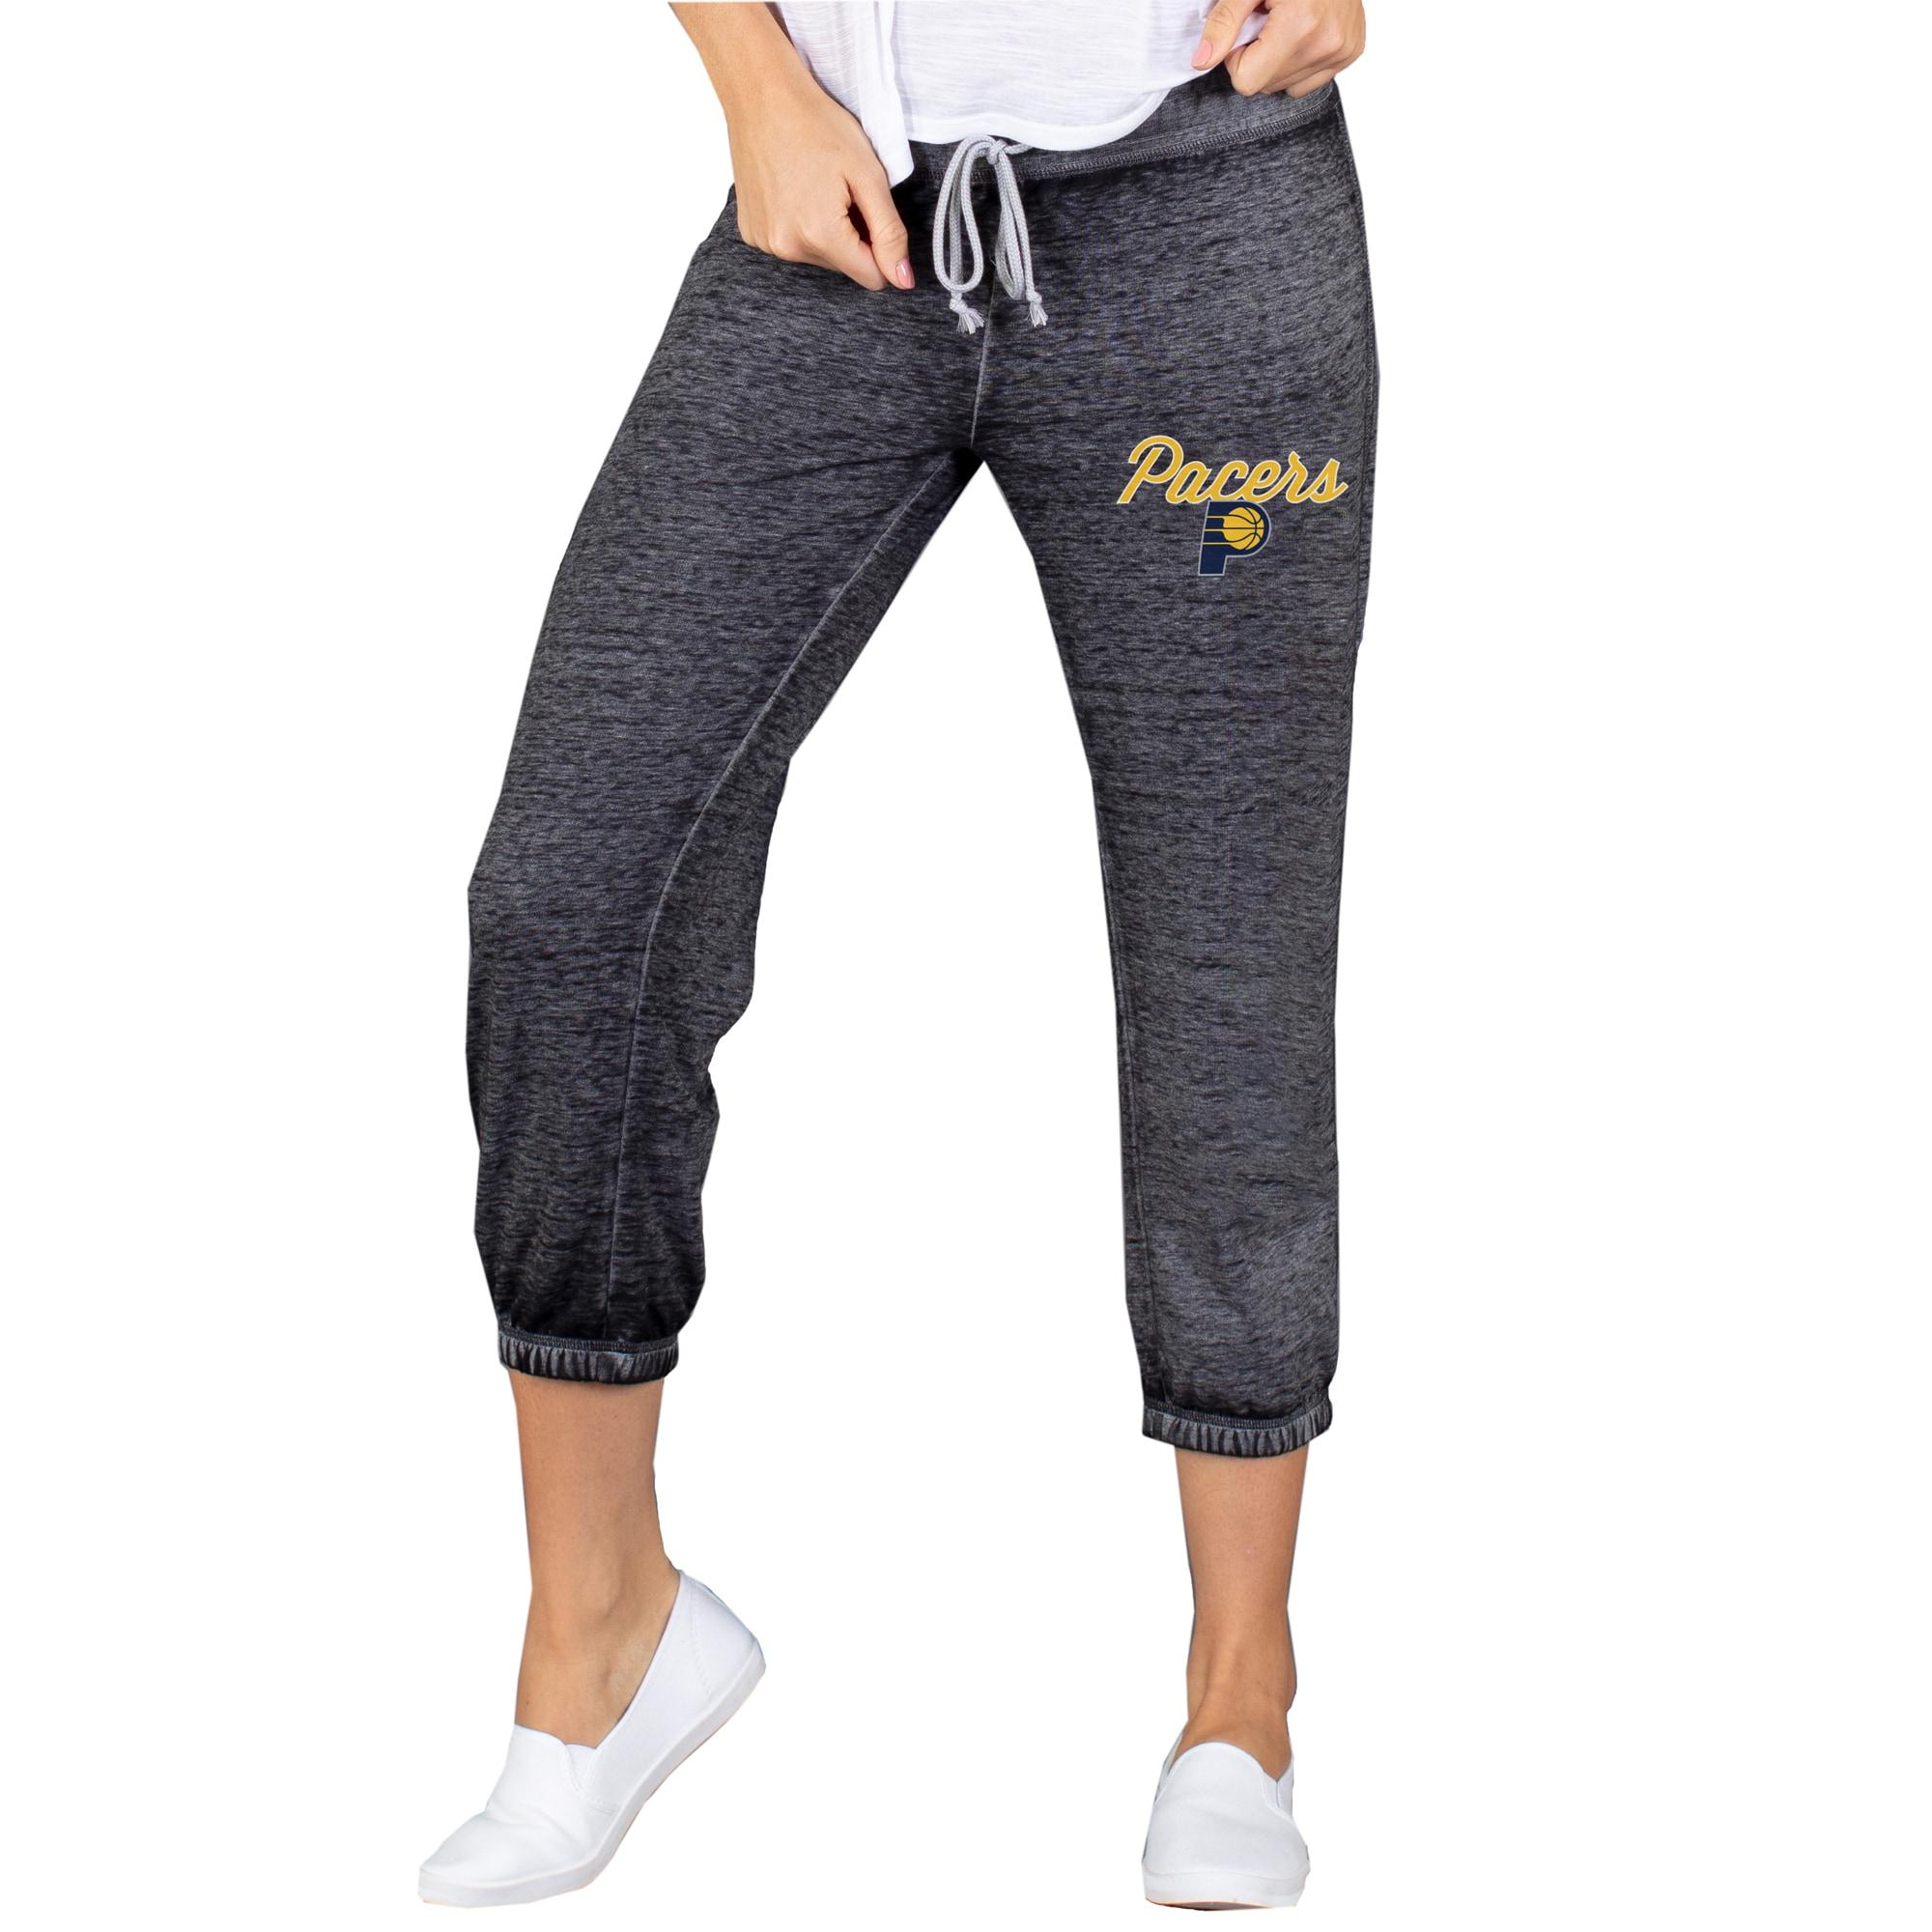 Indiana Pacers Concepts Sport Women's Capri Knit Lounge Pants - Charcoal